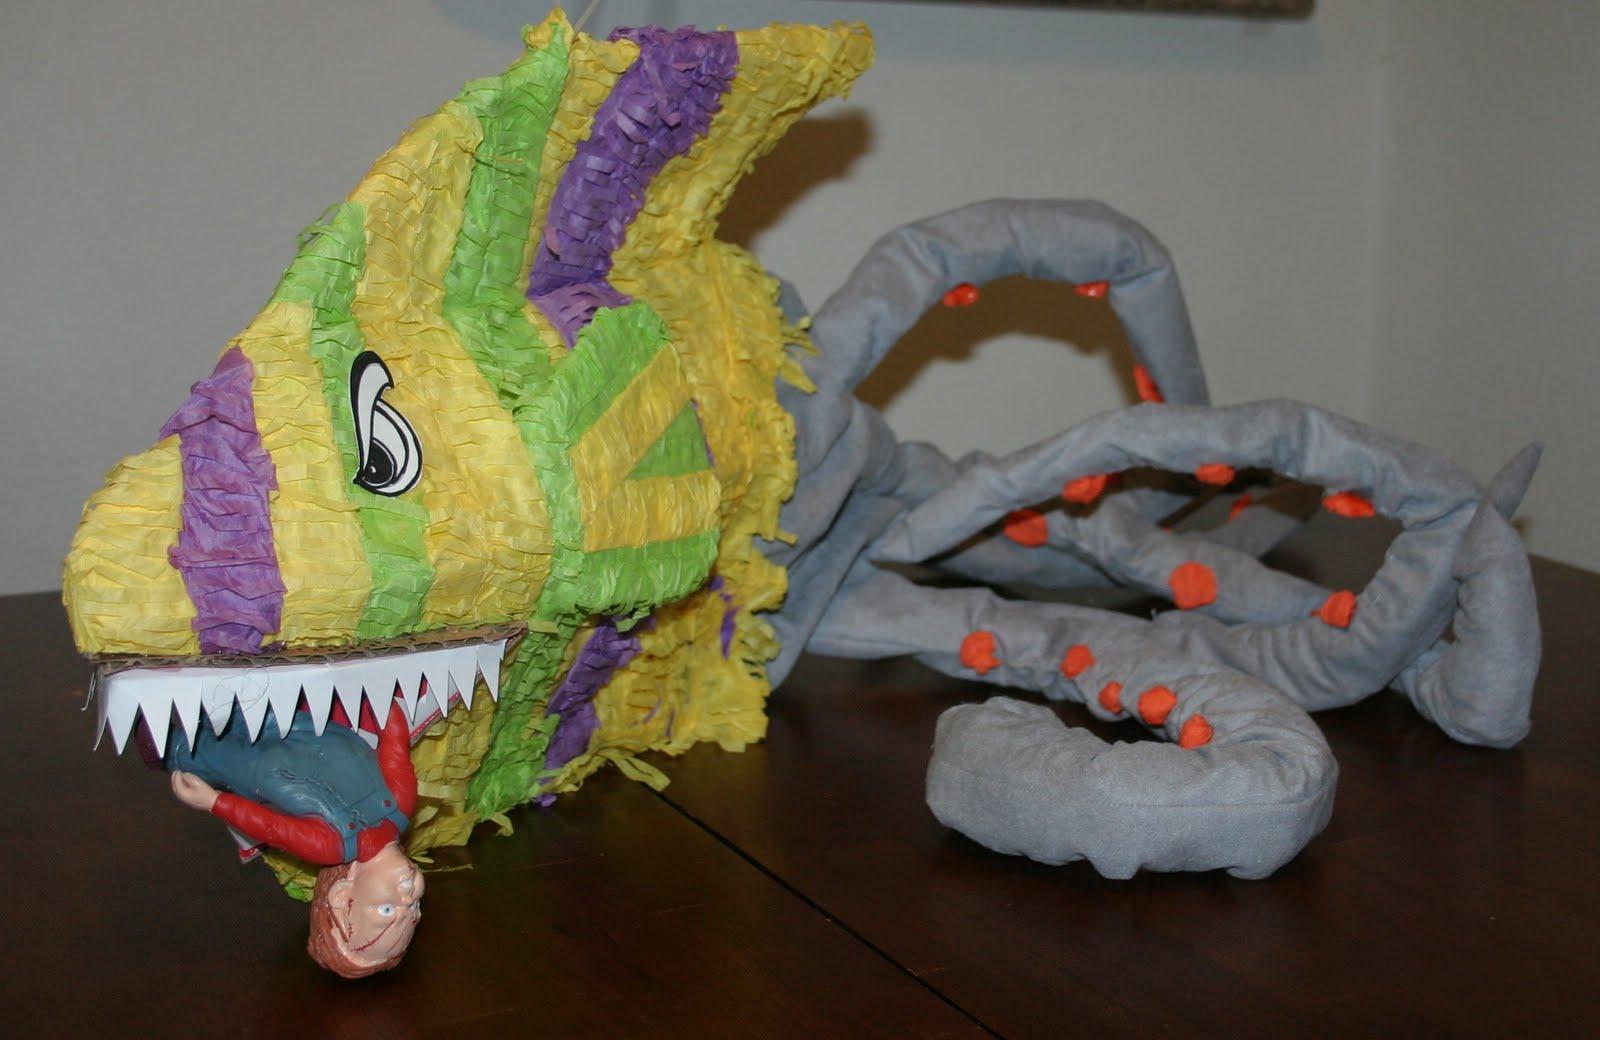 http://1.bp.blogspot.com/_5s67MJWOeAg/TTipVBhqtbI/AAAAAAAAEUY/45PXNELY-Z4/s1600/Sharktopus3.JPG